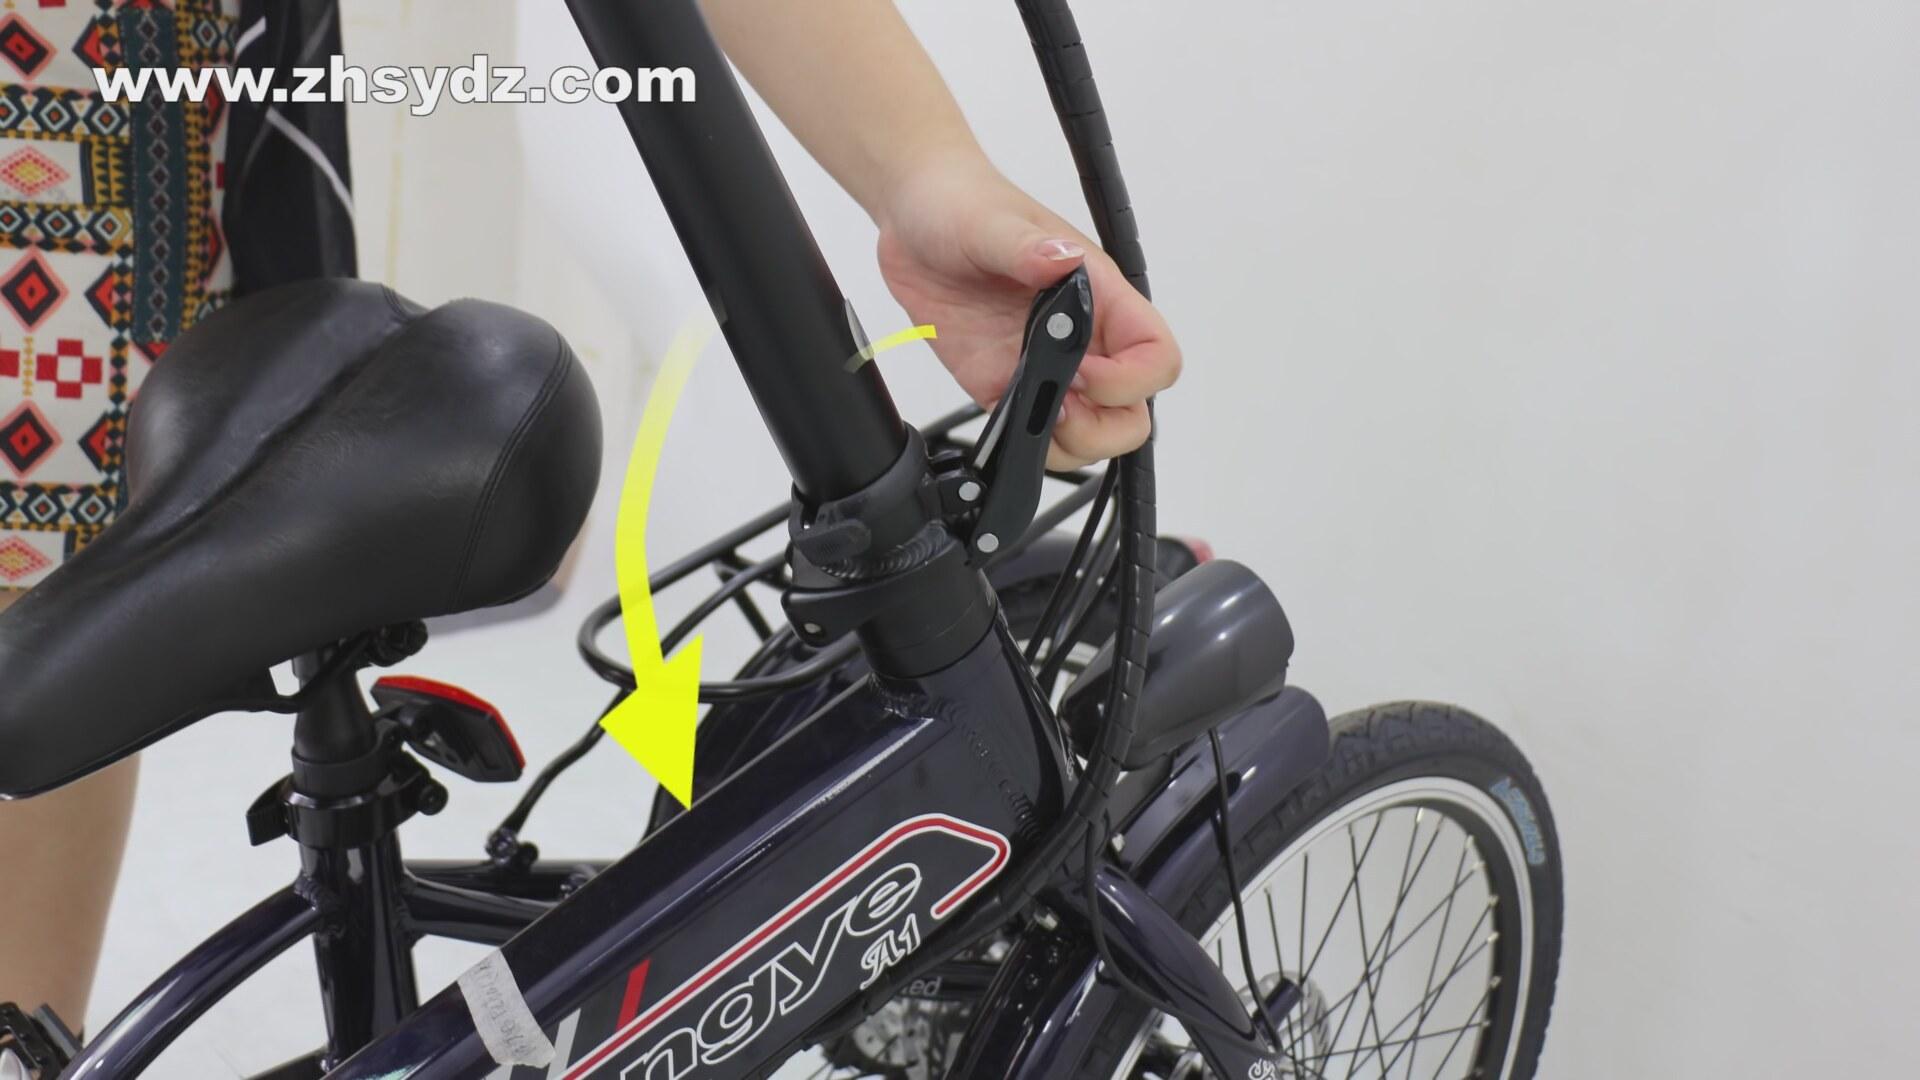 Https Video How To Start A Yoga Practice For Consina Bike Jaket 03 Original Shuangye 20 Inch Mini Folding Electric A1 9928022 15870 1920x1080